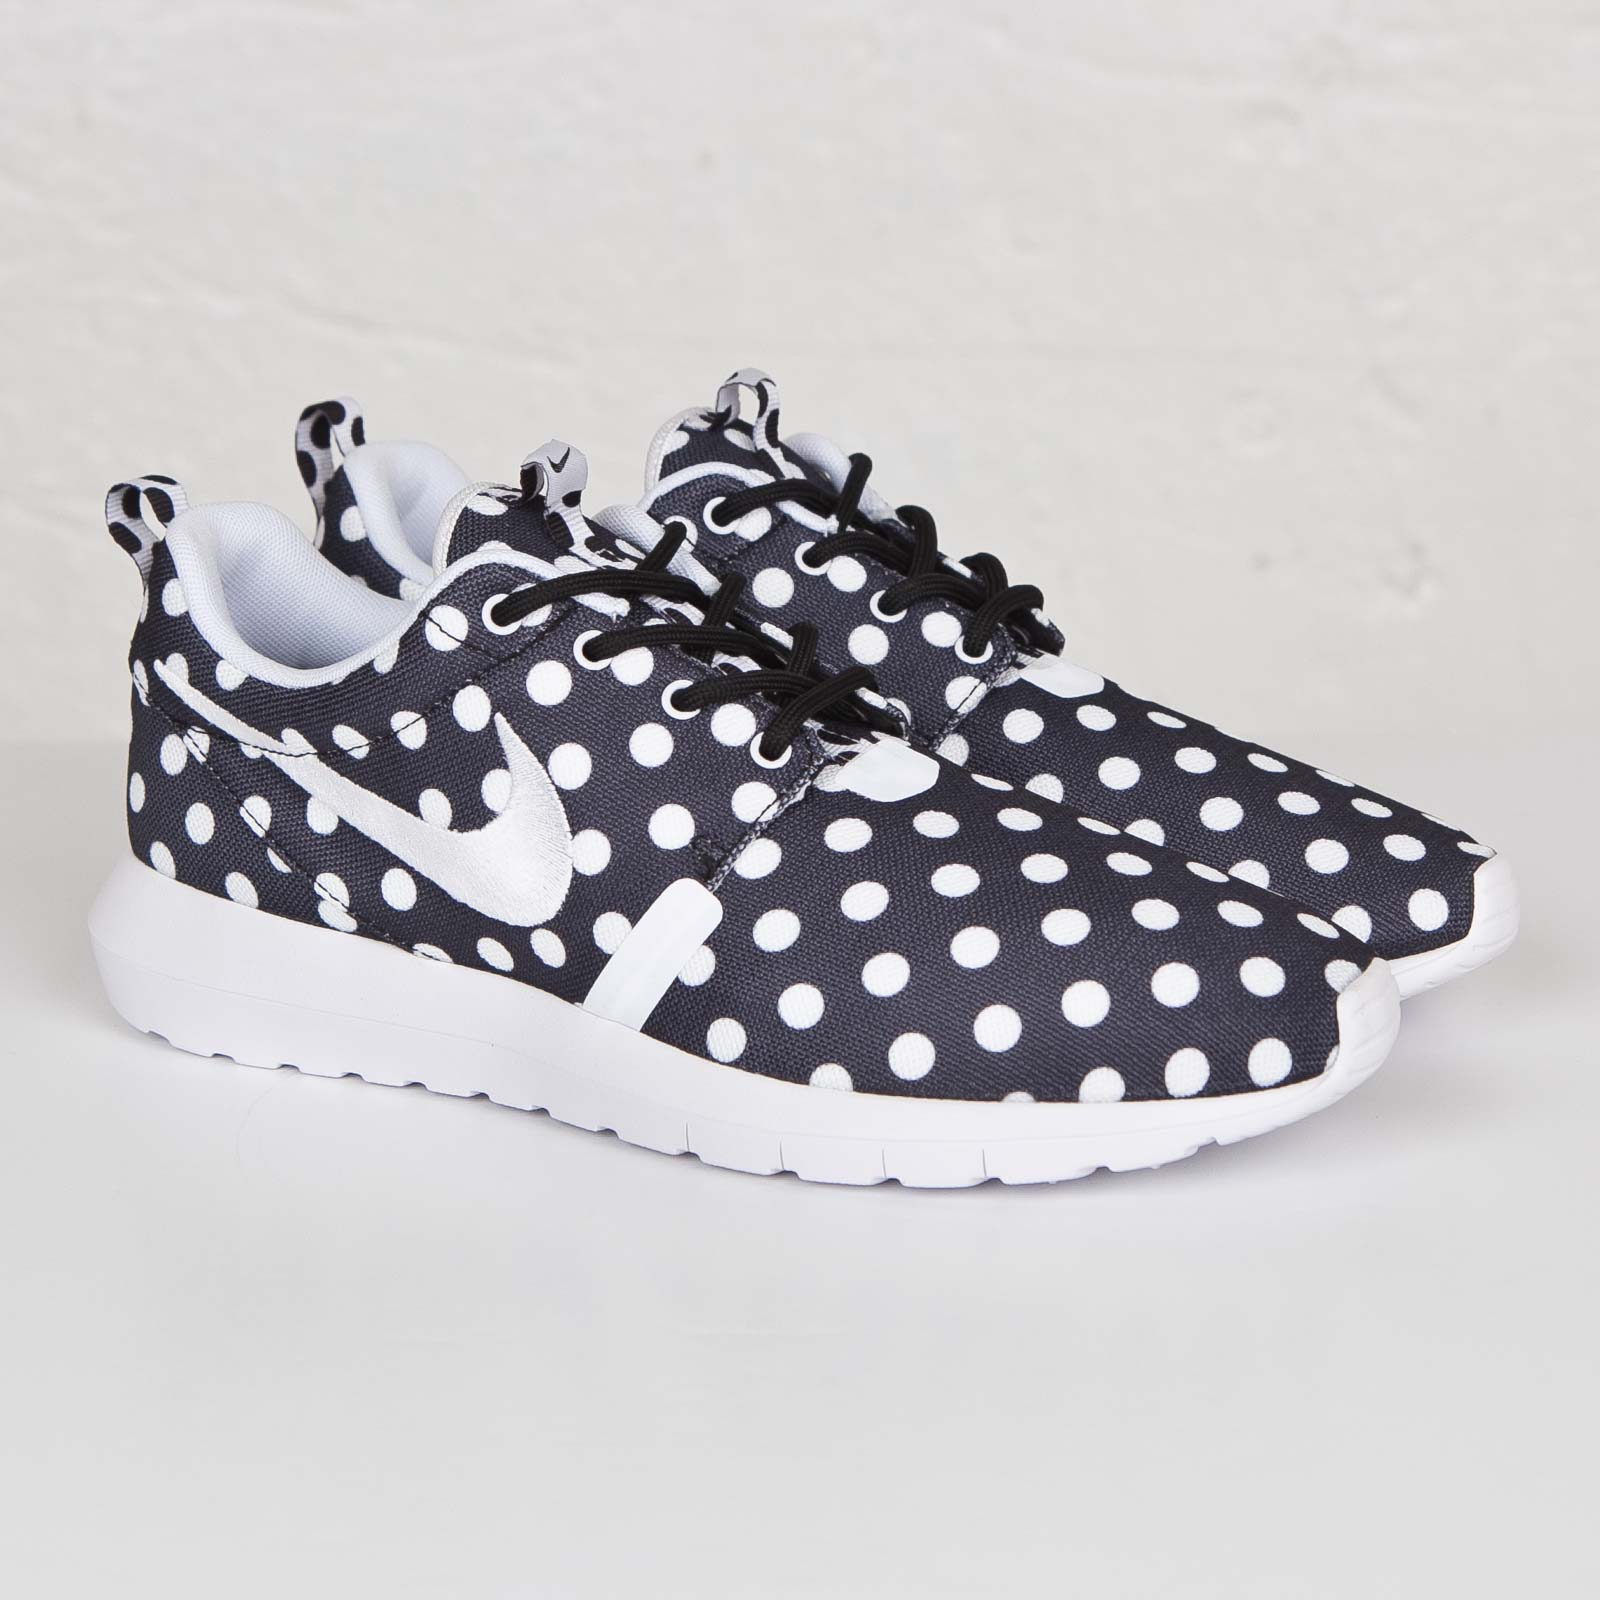 b84a00cc9754 Nike Roshe NM QS - 810857-001 - Sneakersnstuff